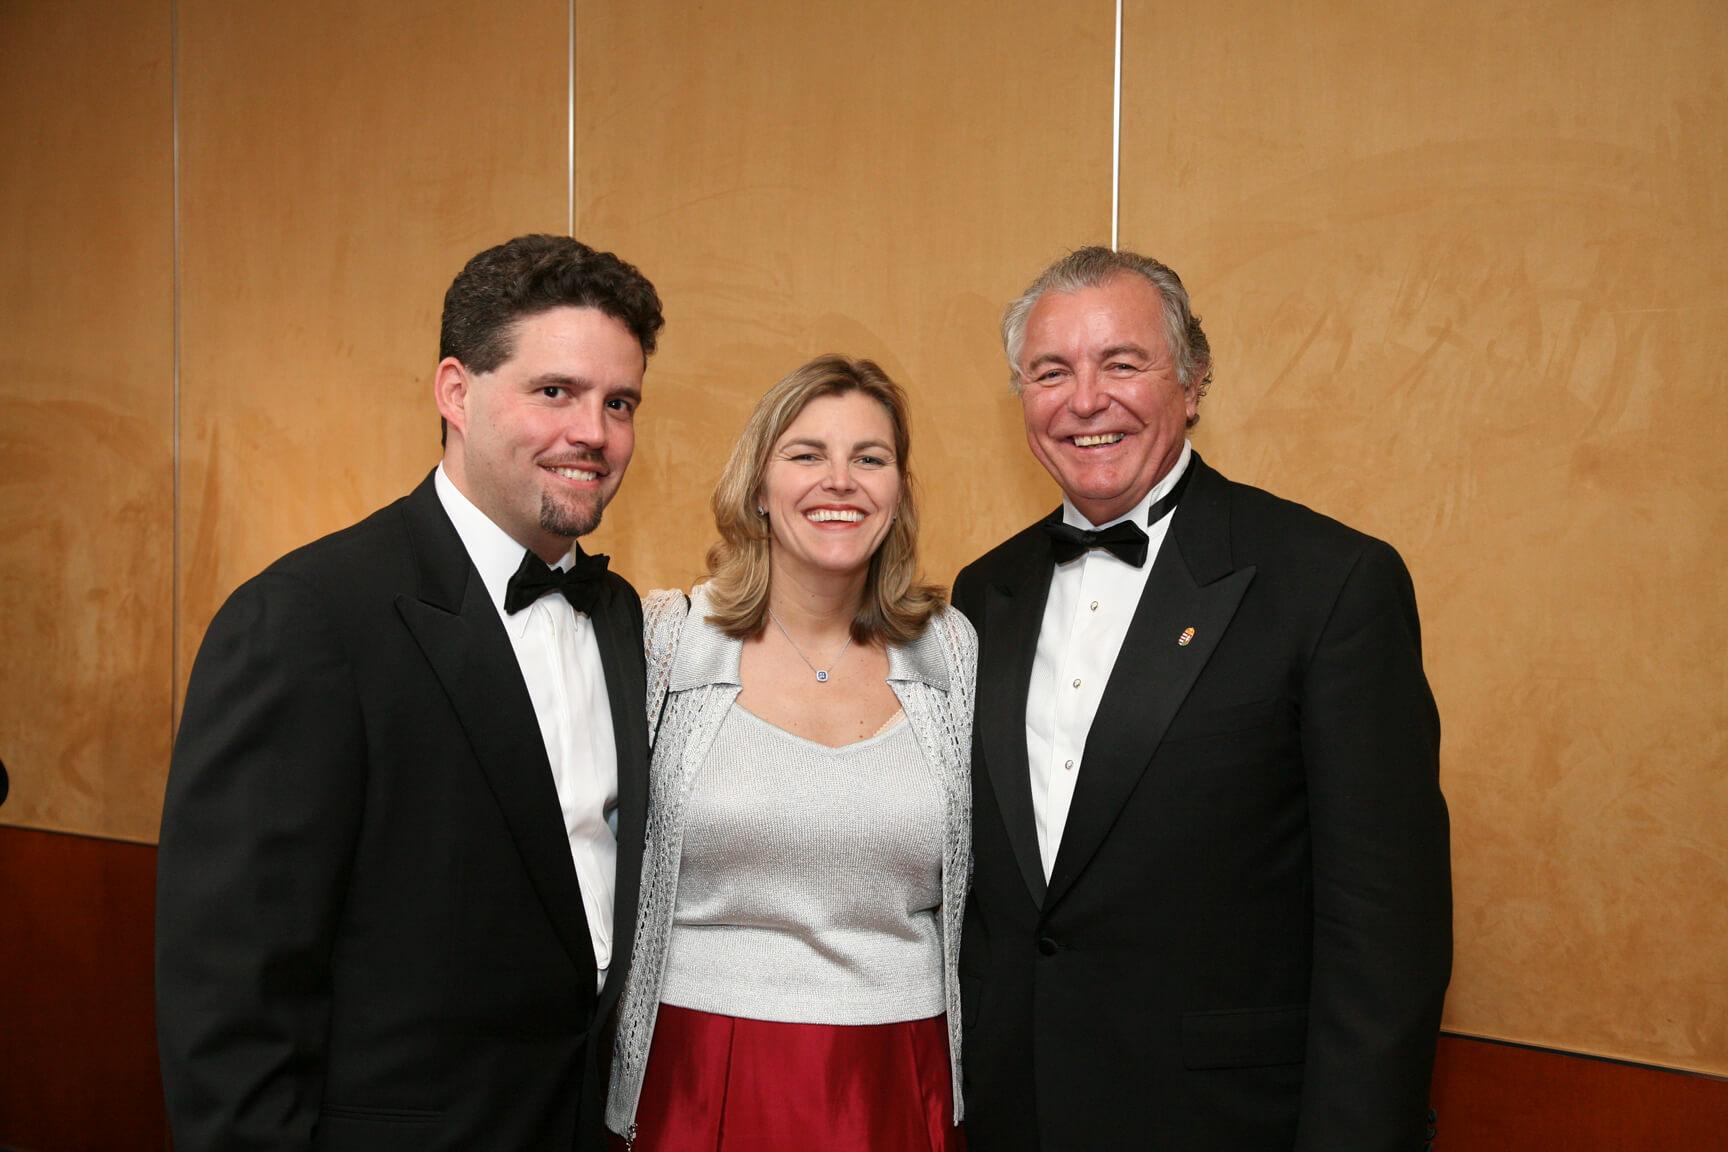 Mr. Barton Rice Jr., Mrs. Andrea Lauer Rice, Mr. John N. Lauer